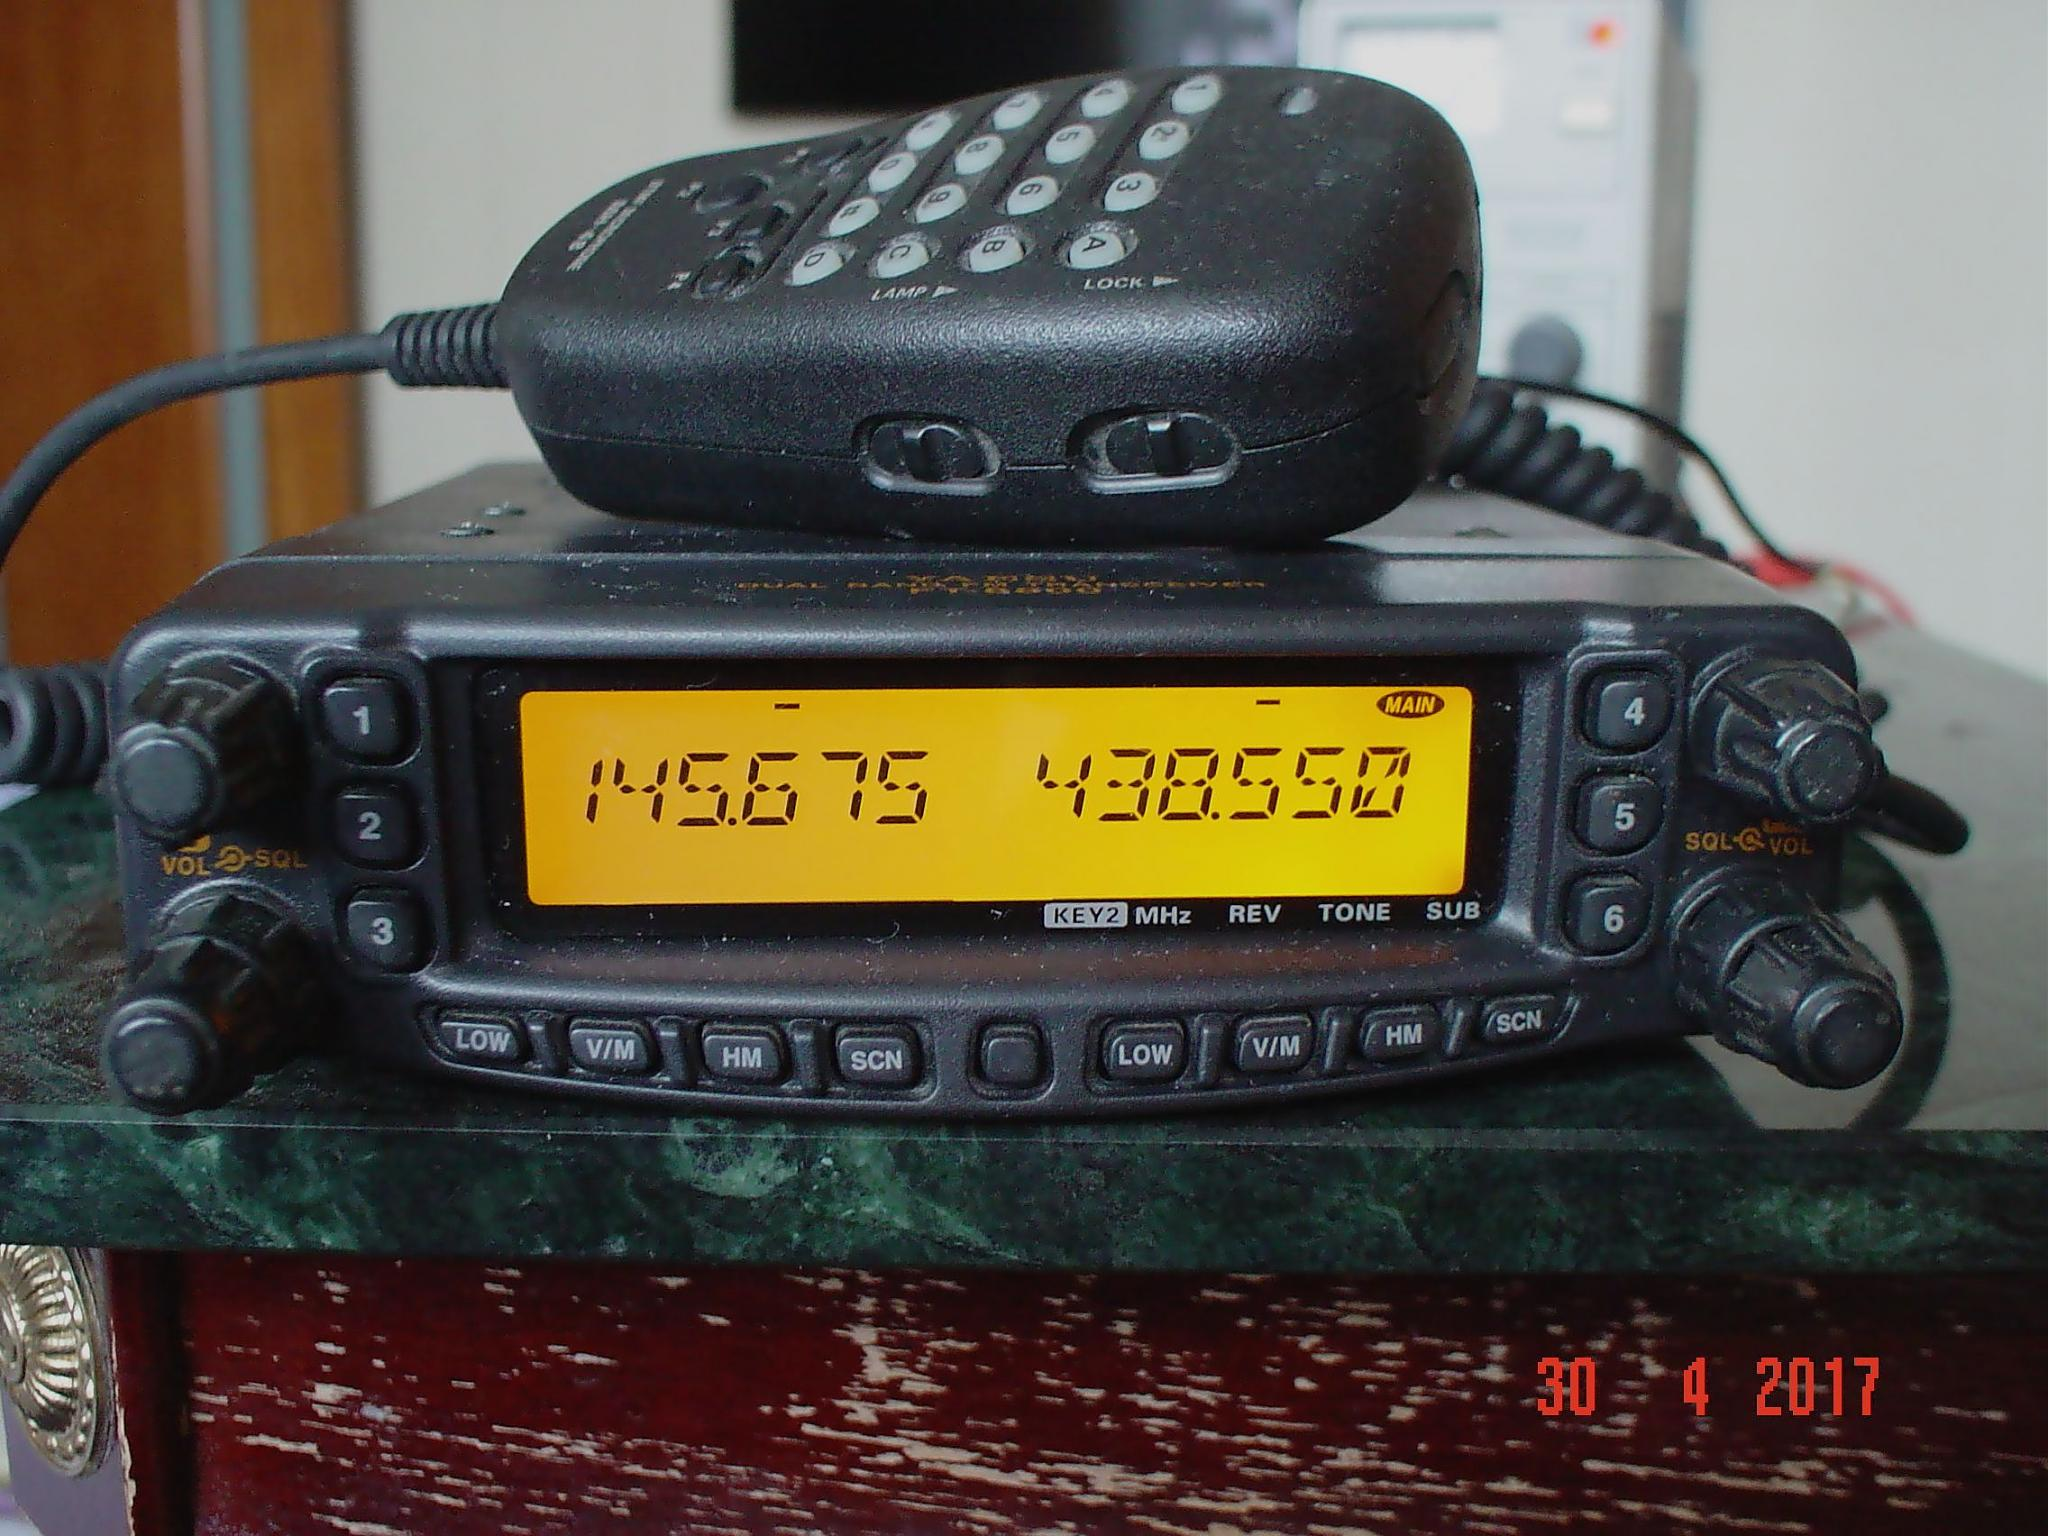 блок питаний к радиостанций ангара 1 схема